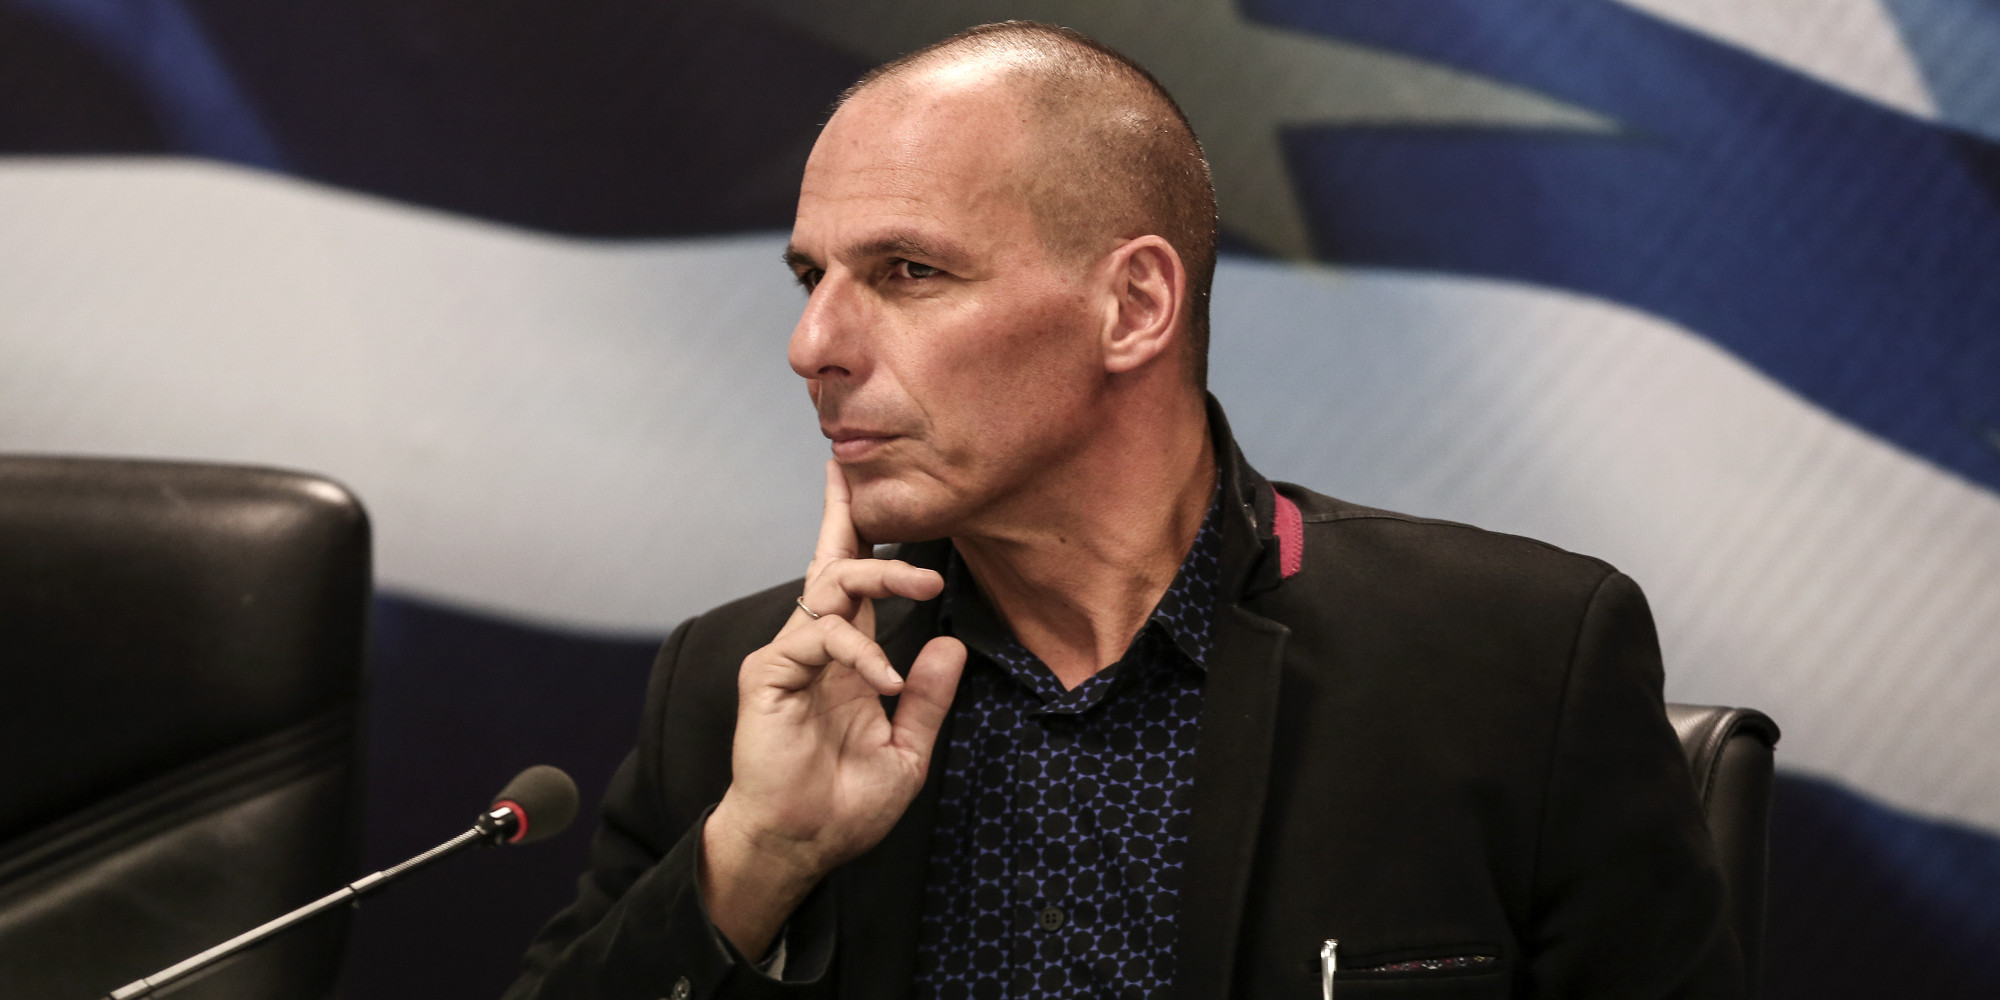 Yannis Varoufakis ekonomia ministroa.